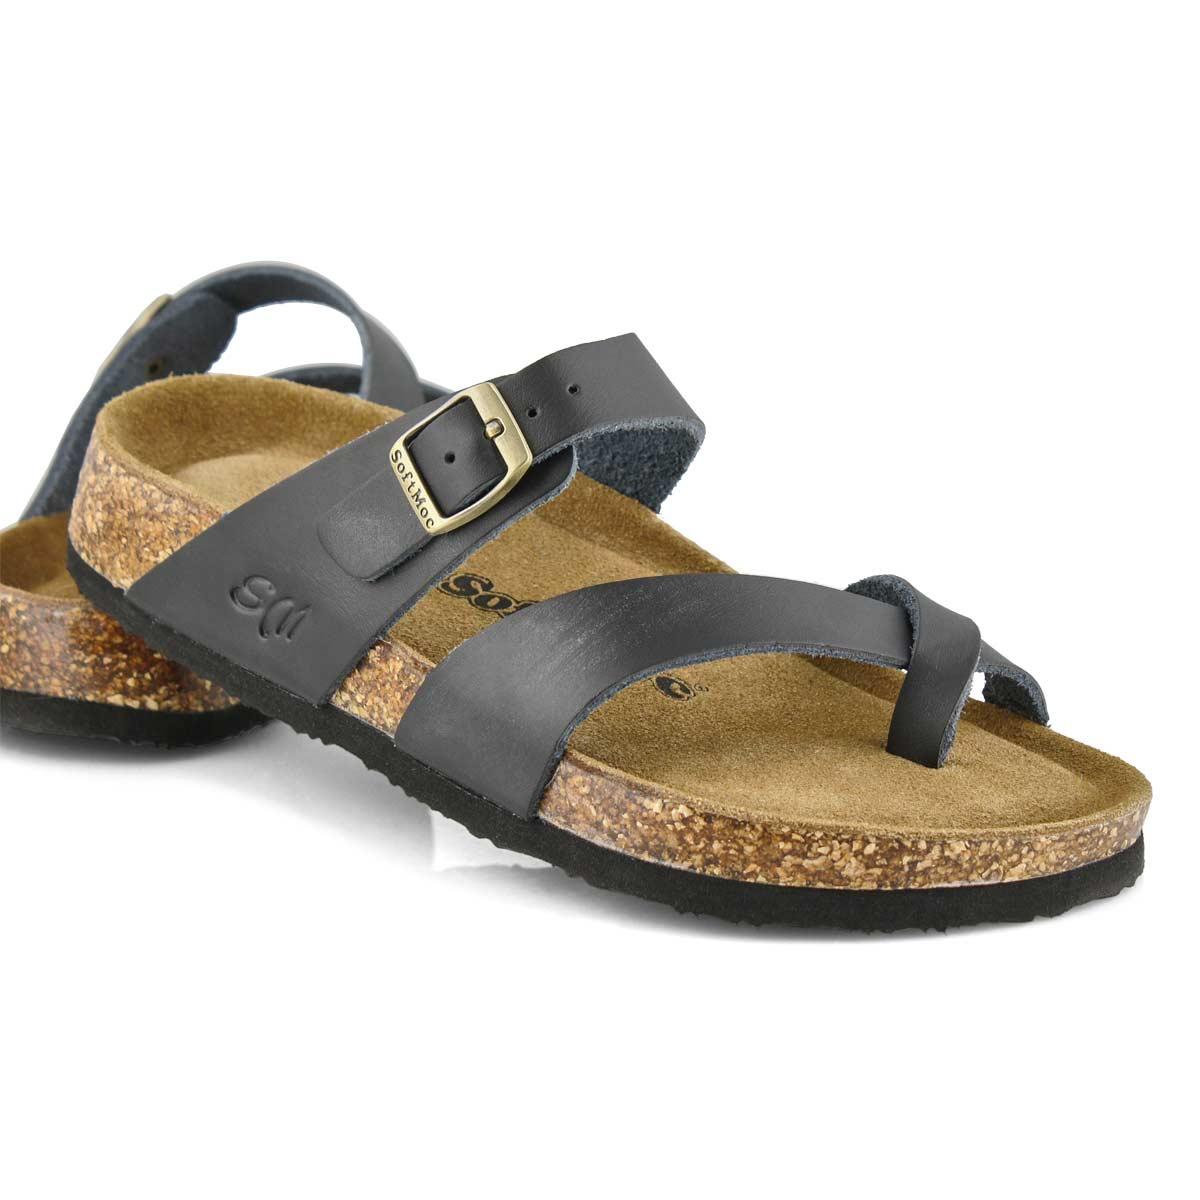 Lds Alicia 5 blk memory foam sandal